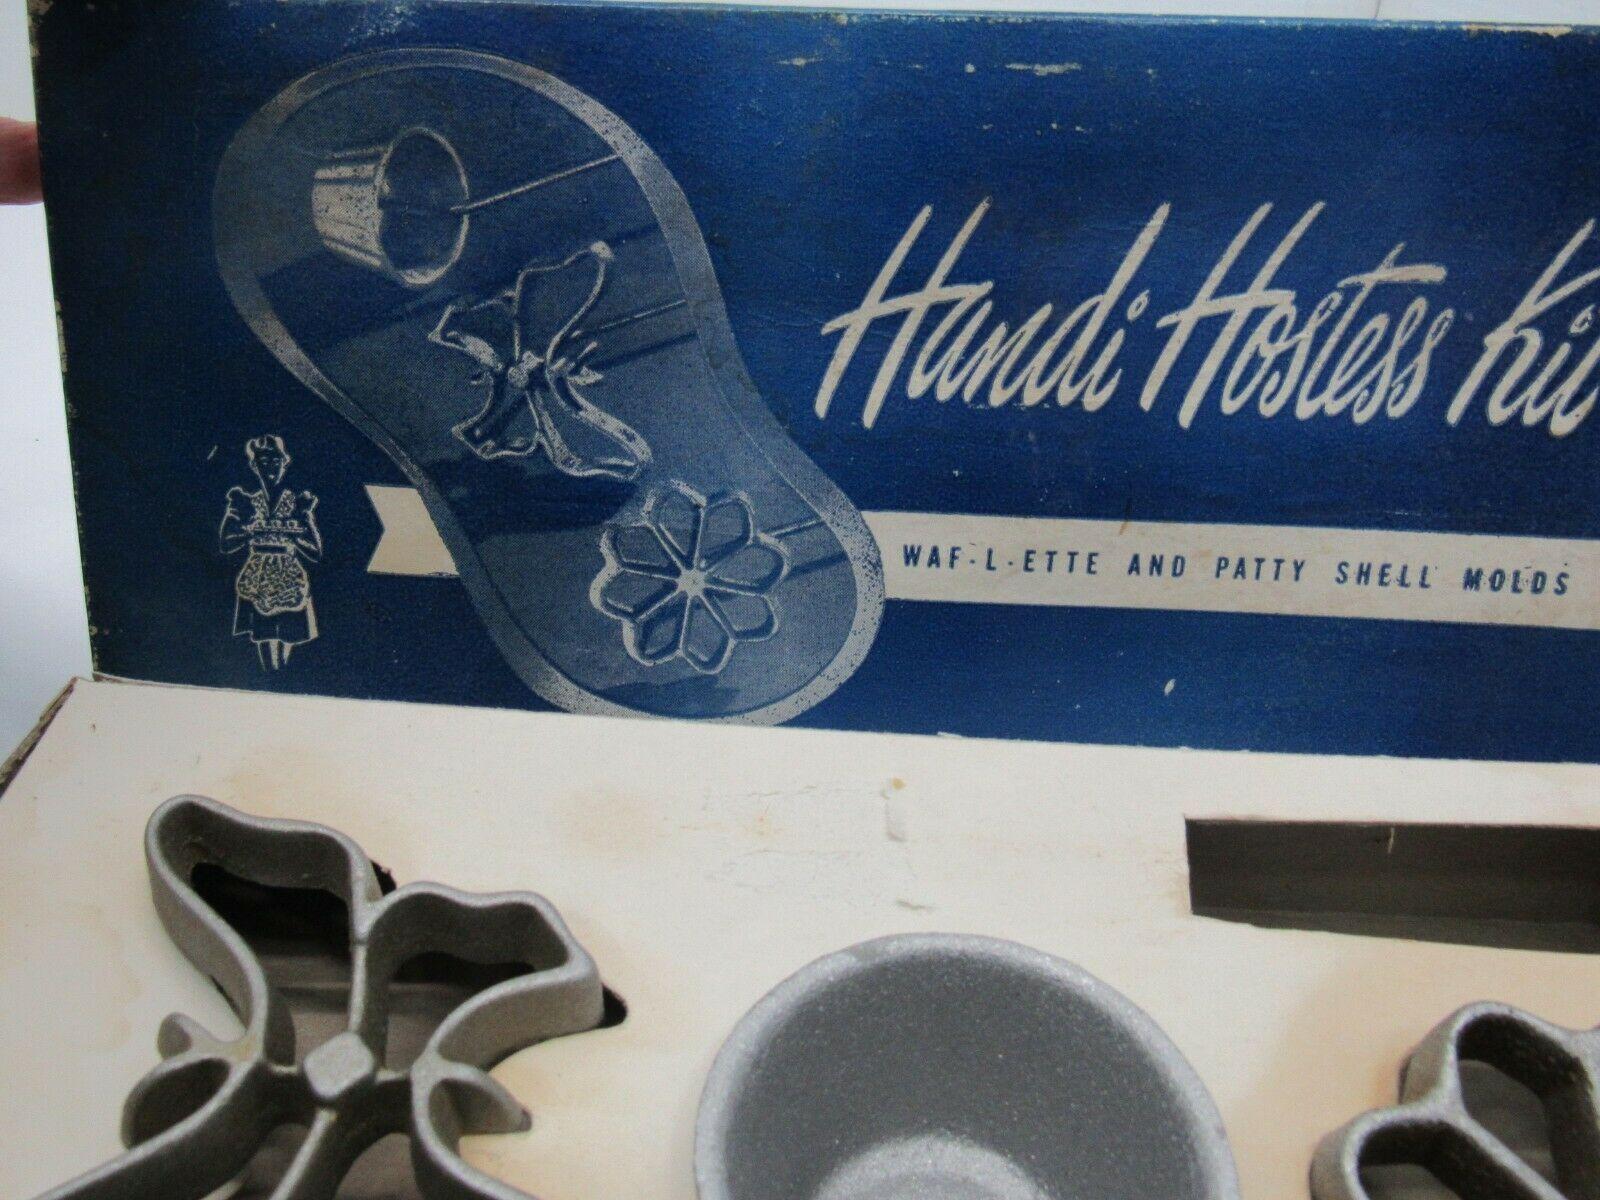 Handi Hostess Kit Waf-L-Ette Patty Shell Rosette Mold Waffle Org Box Bonley image 2